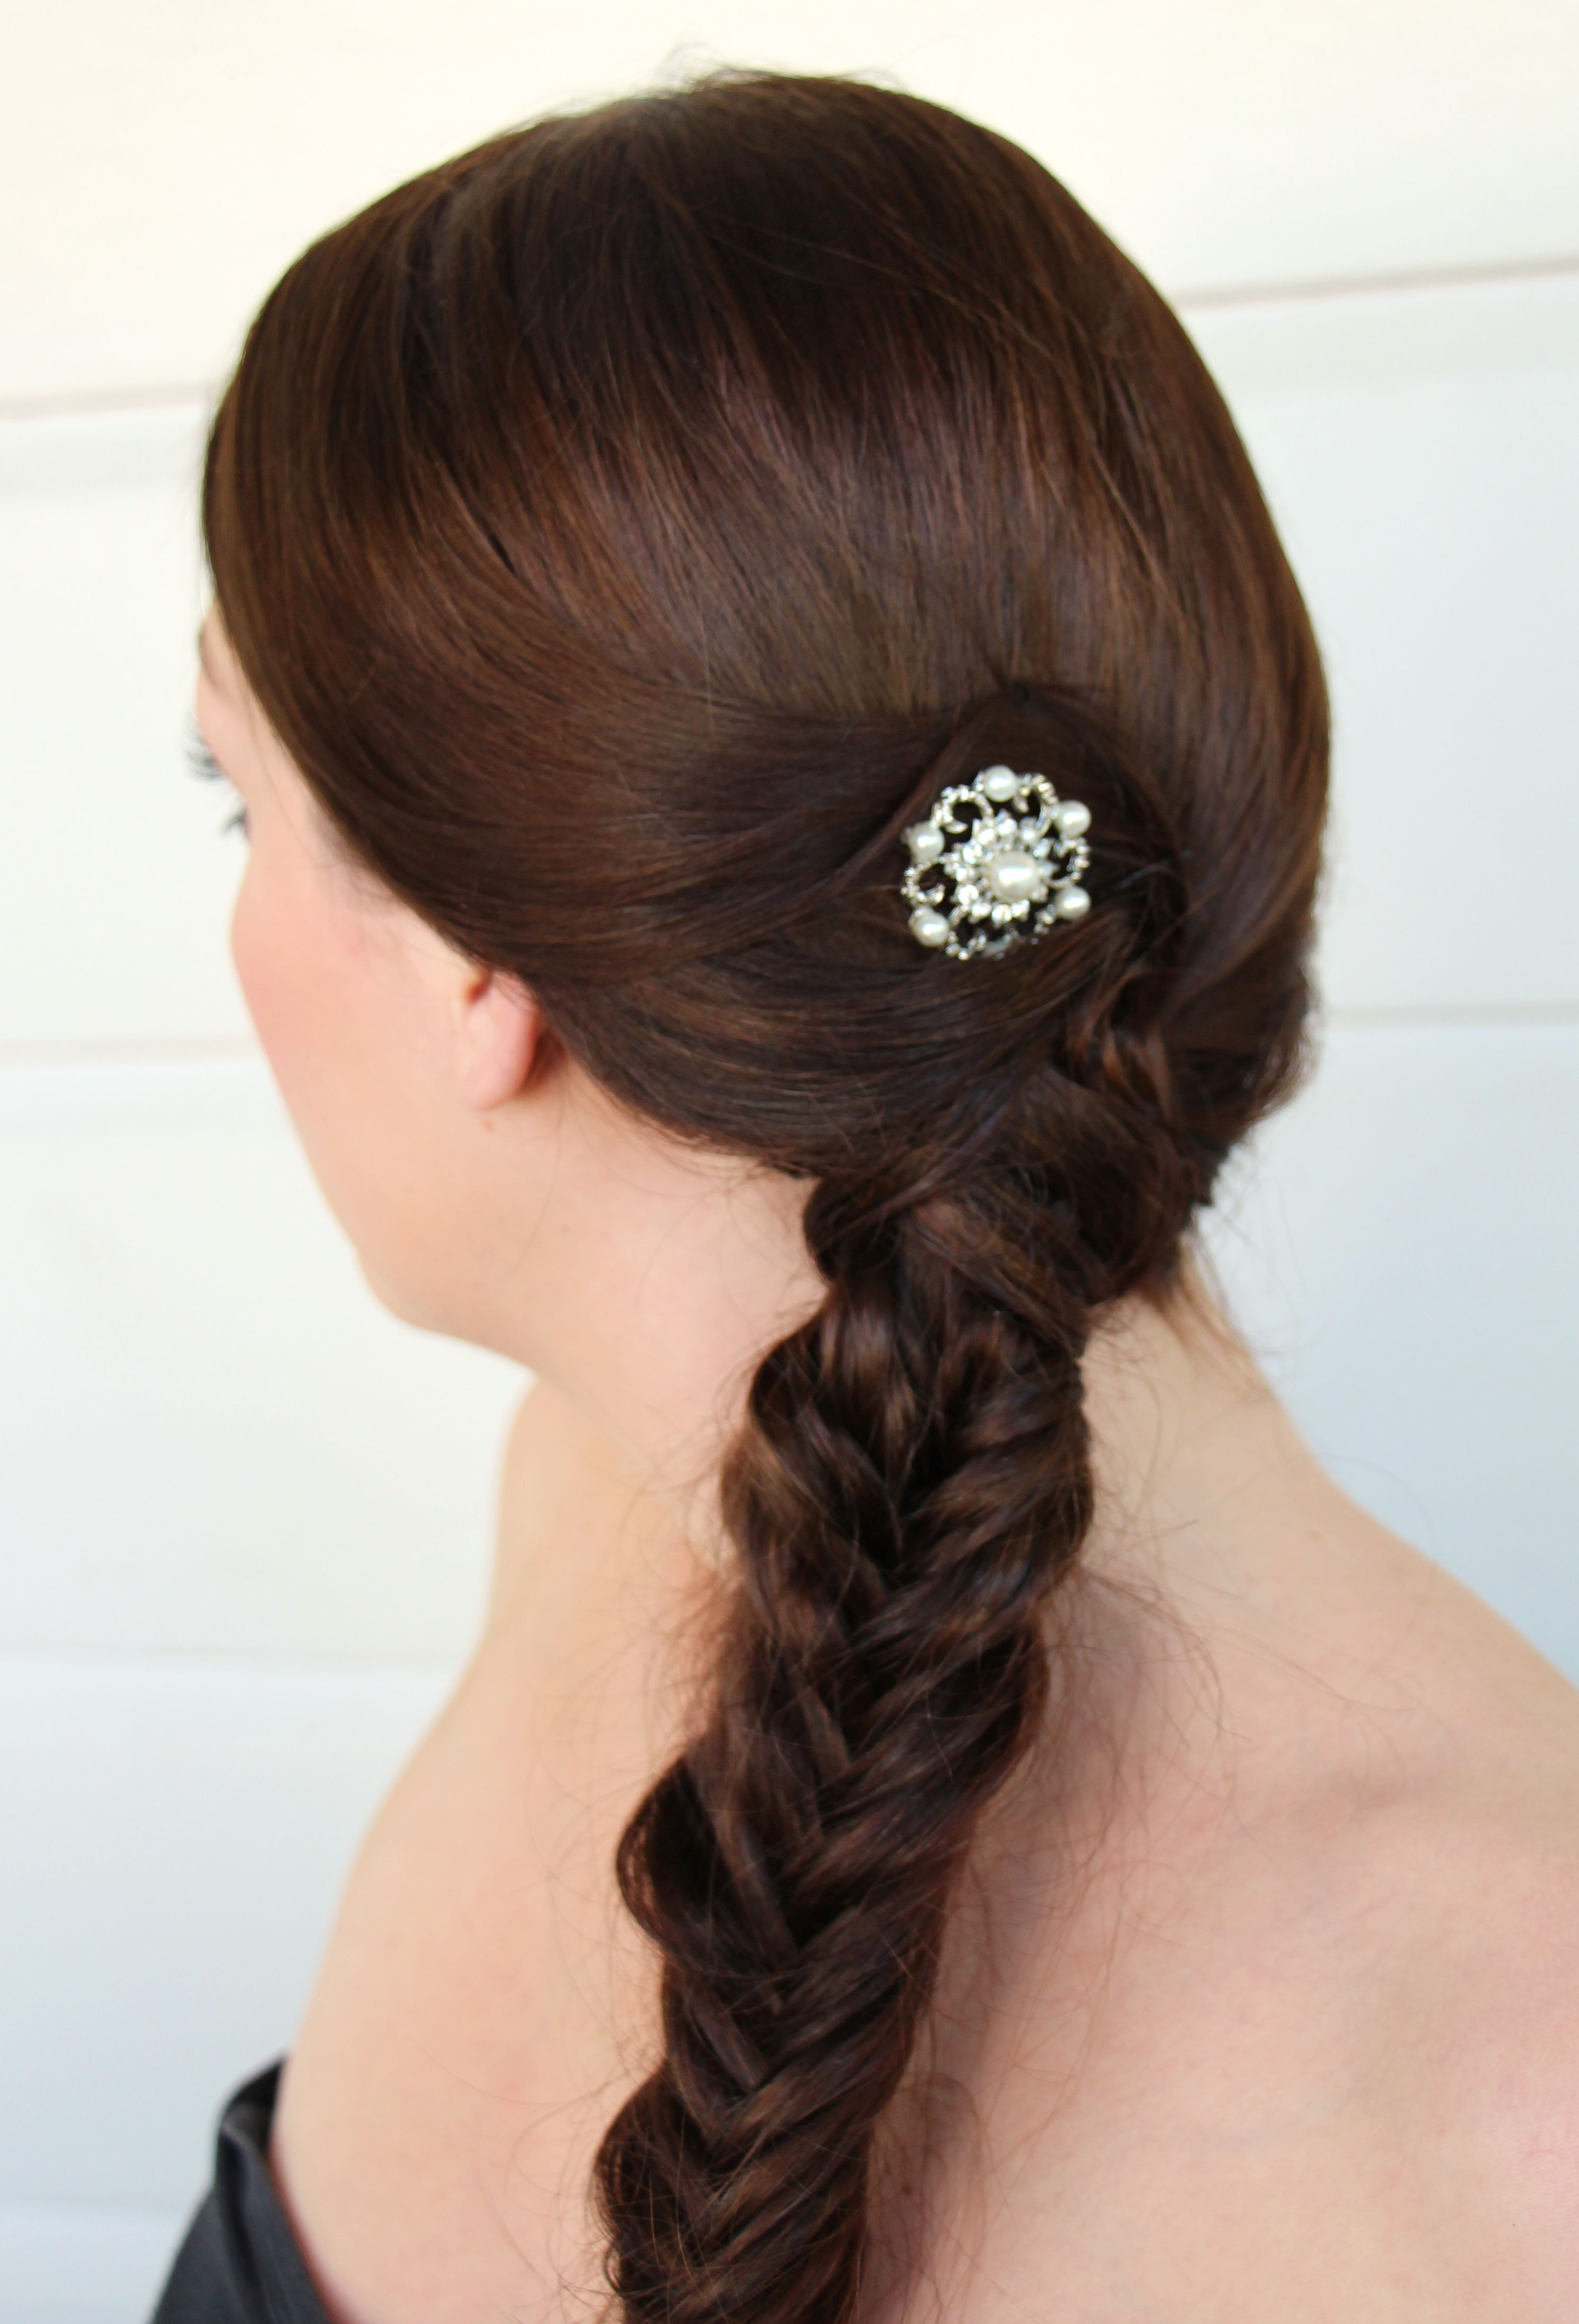 WEDDING DAY HAIR: ELEGANT FISHTAIL BUN HOW TO images